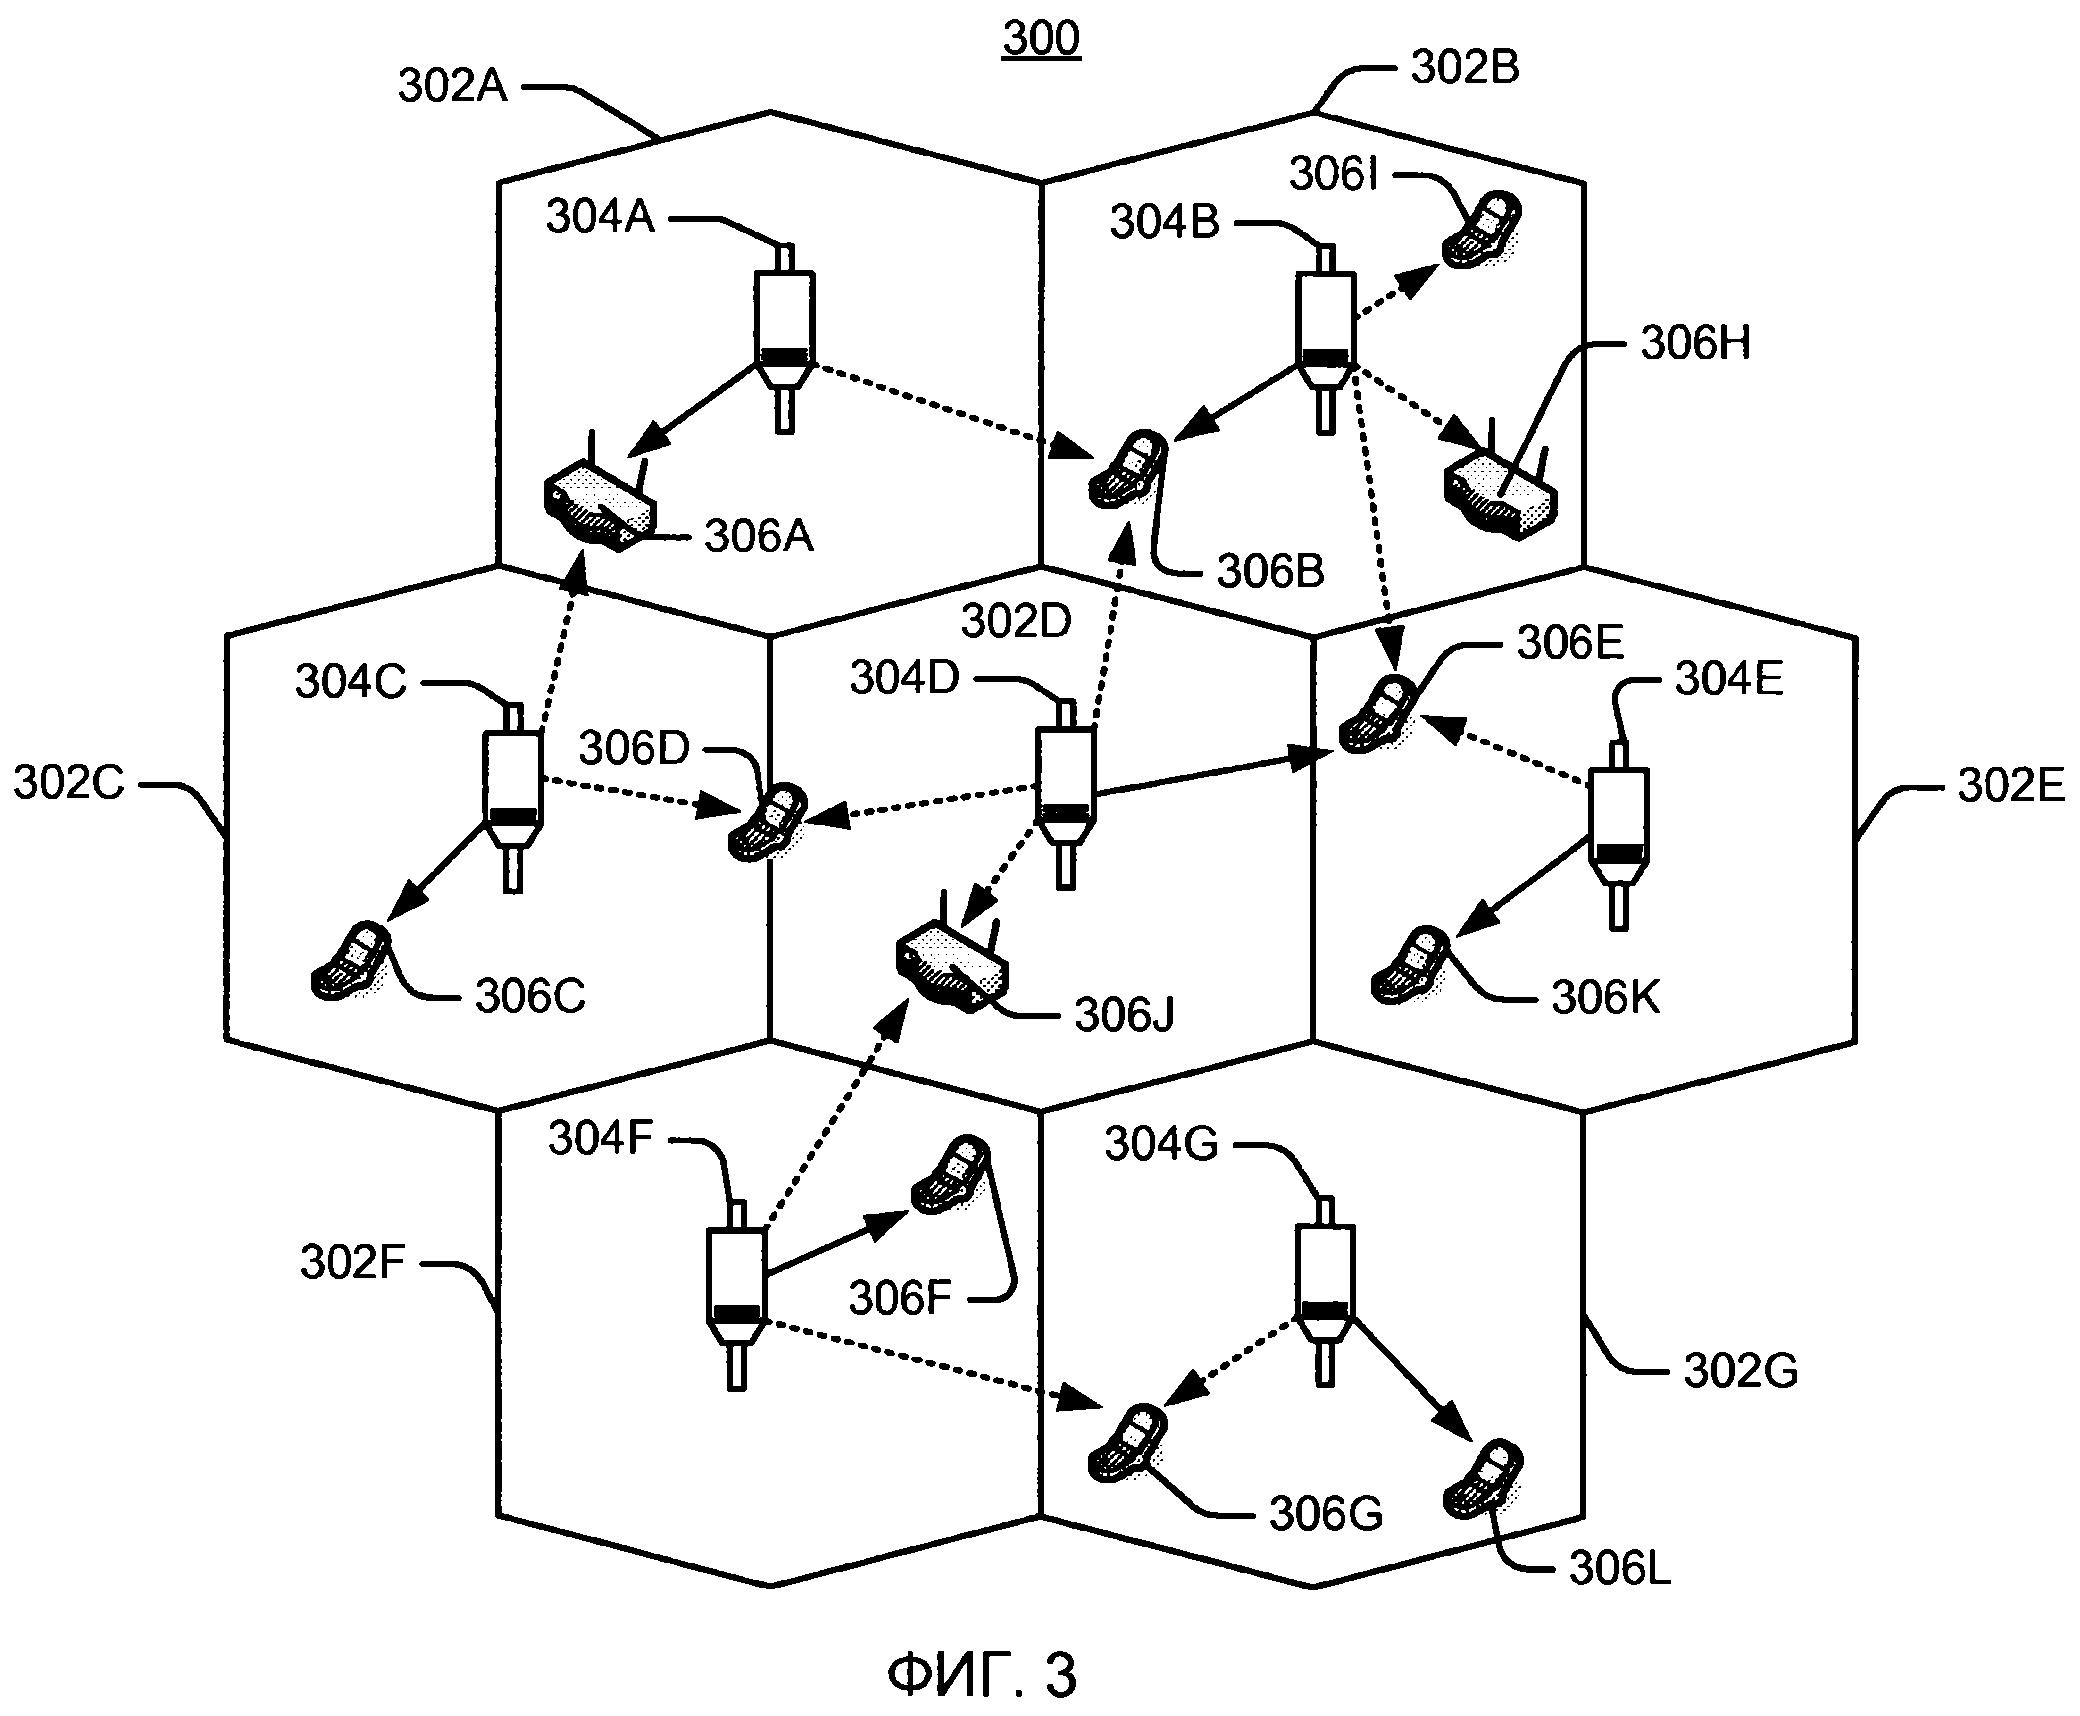 Конфигурация точки доступа на основе принятых сигналов точки доступа